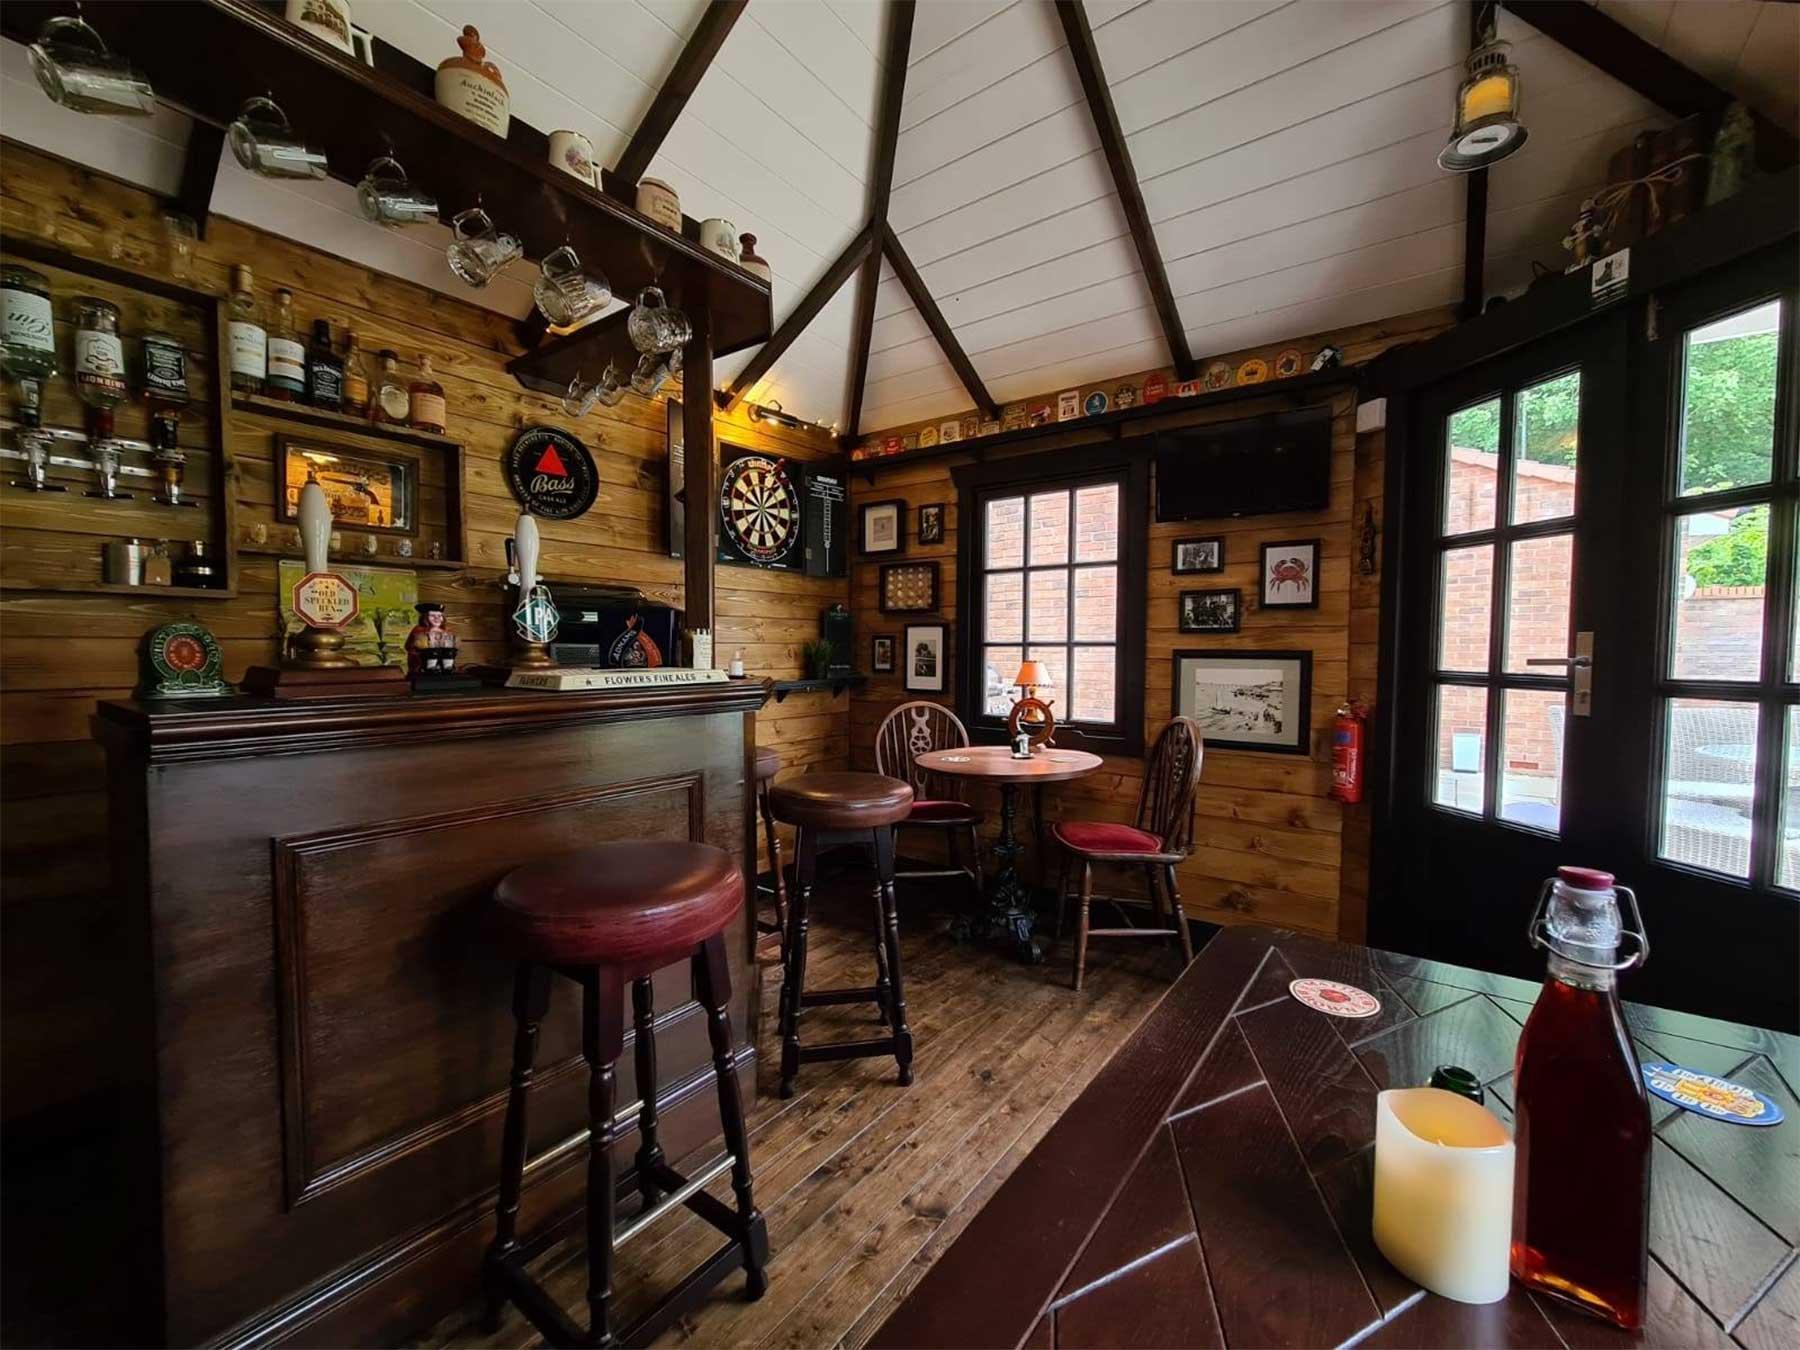 DIY-Mini-Pub im eigenen Garten gebaut the-drunken-crab-privater-pub_07